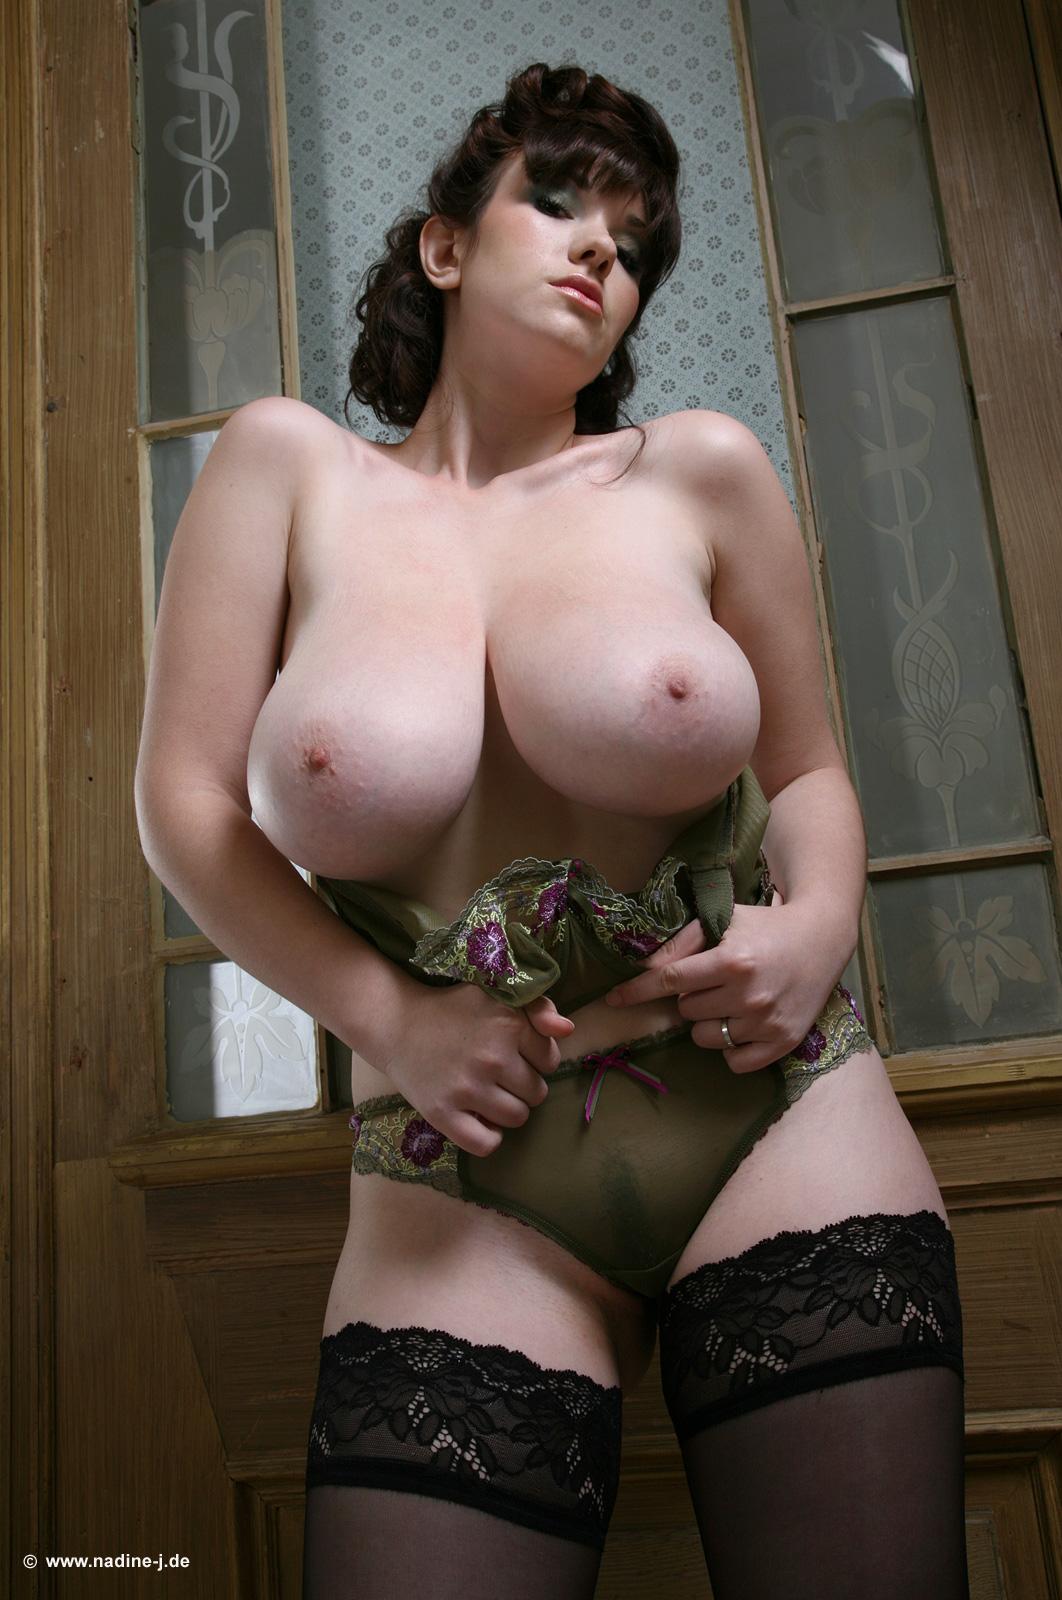 Tanya song big tits, jeri ryan seven of nude